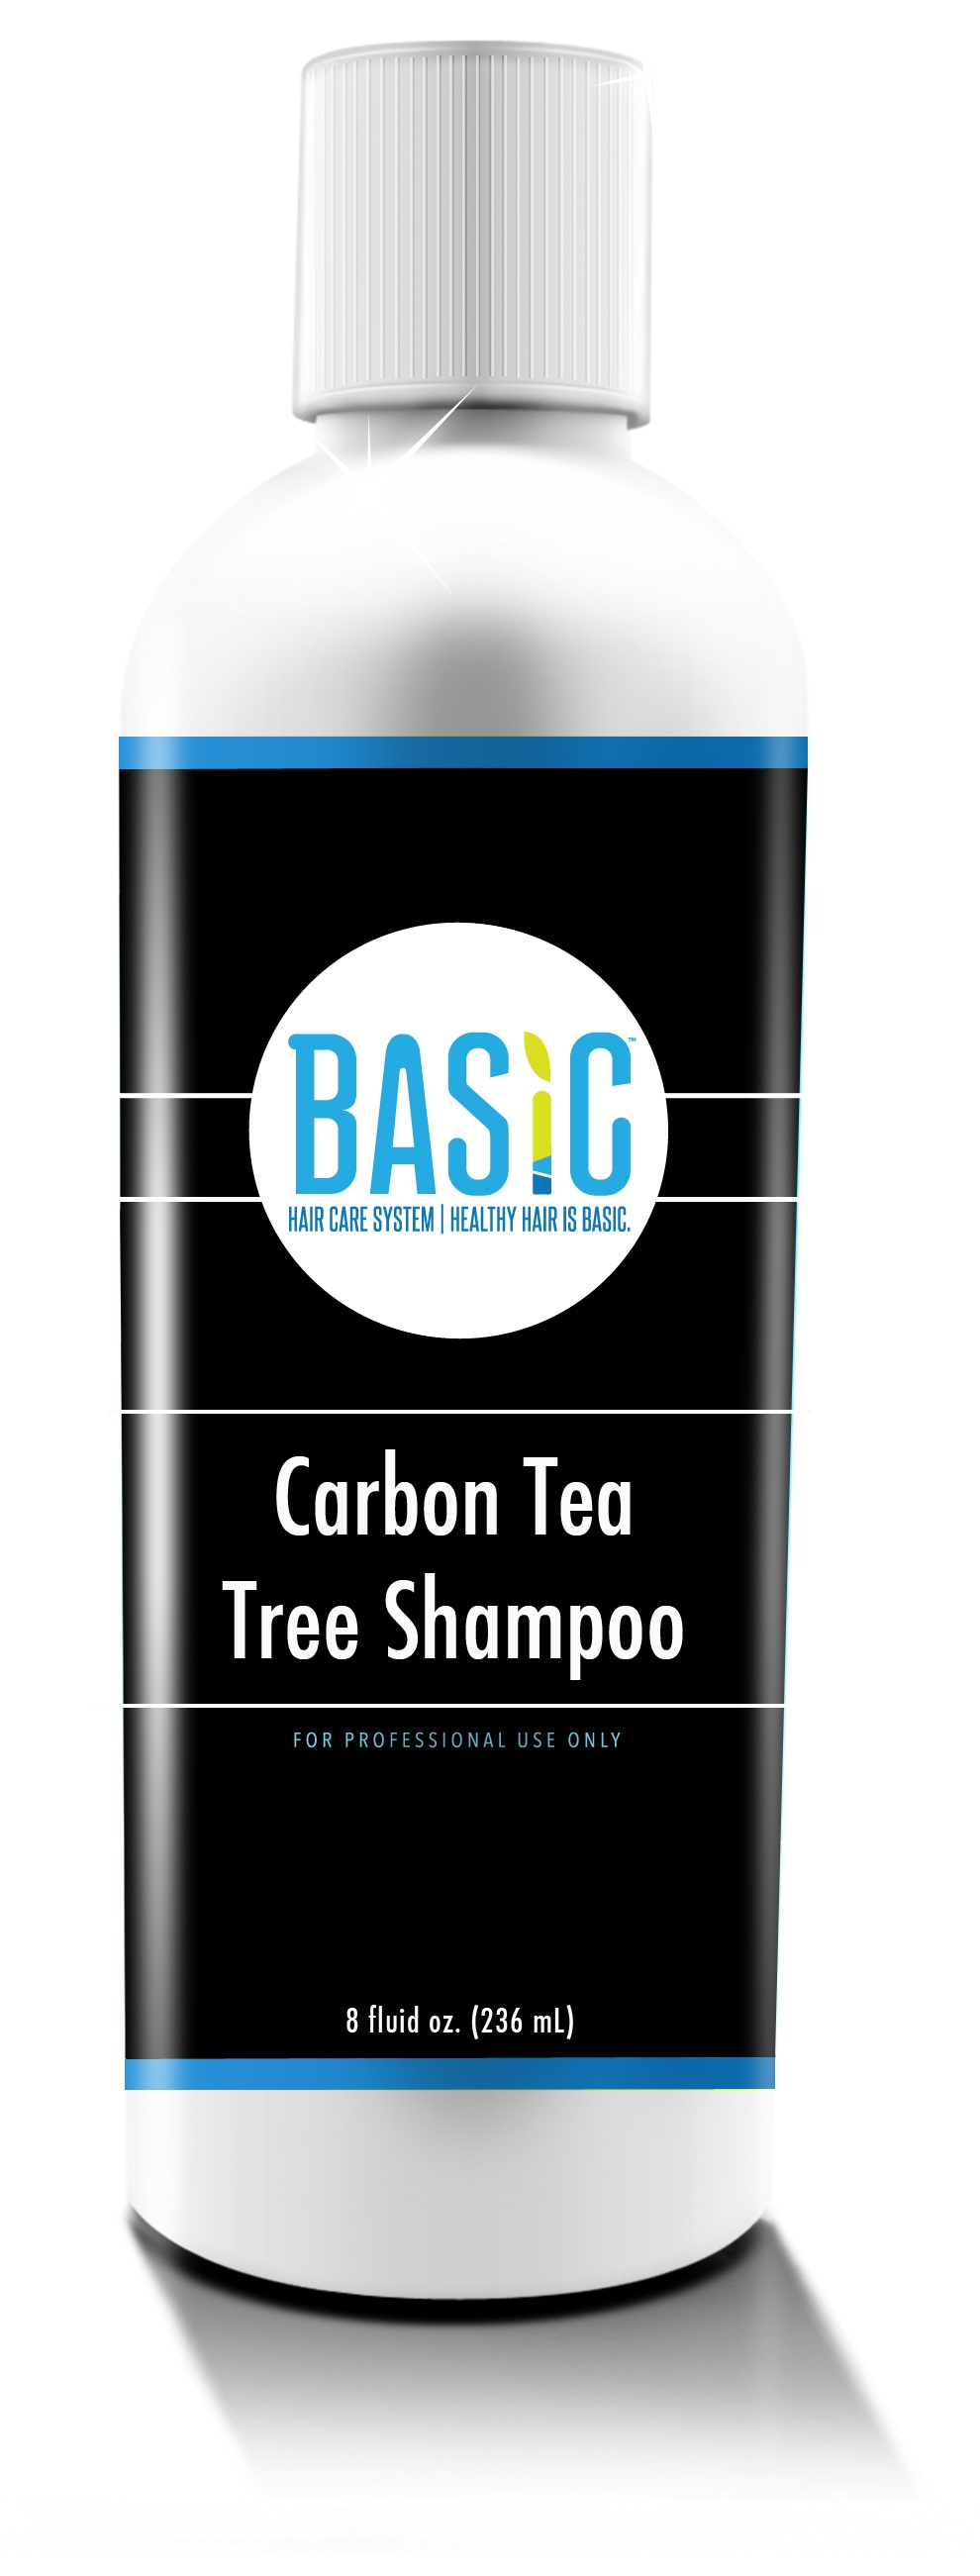 Carbon Tea Tree Shampoo